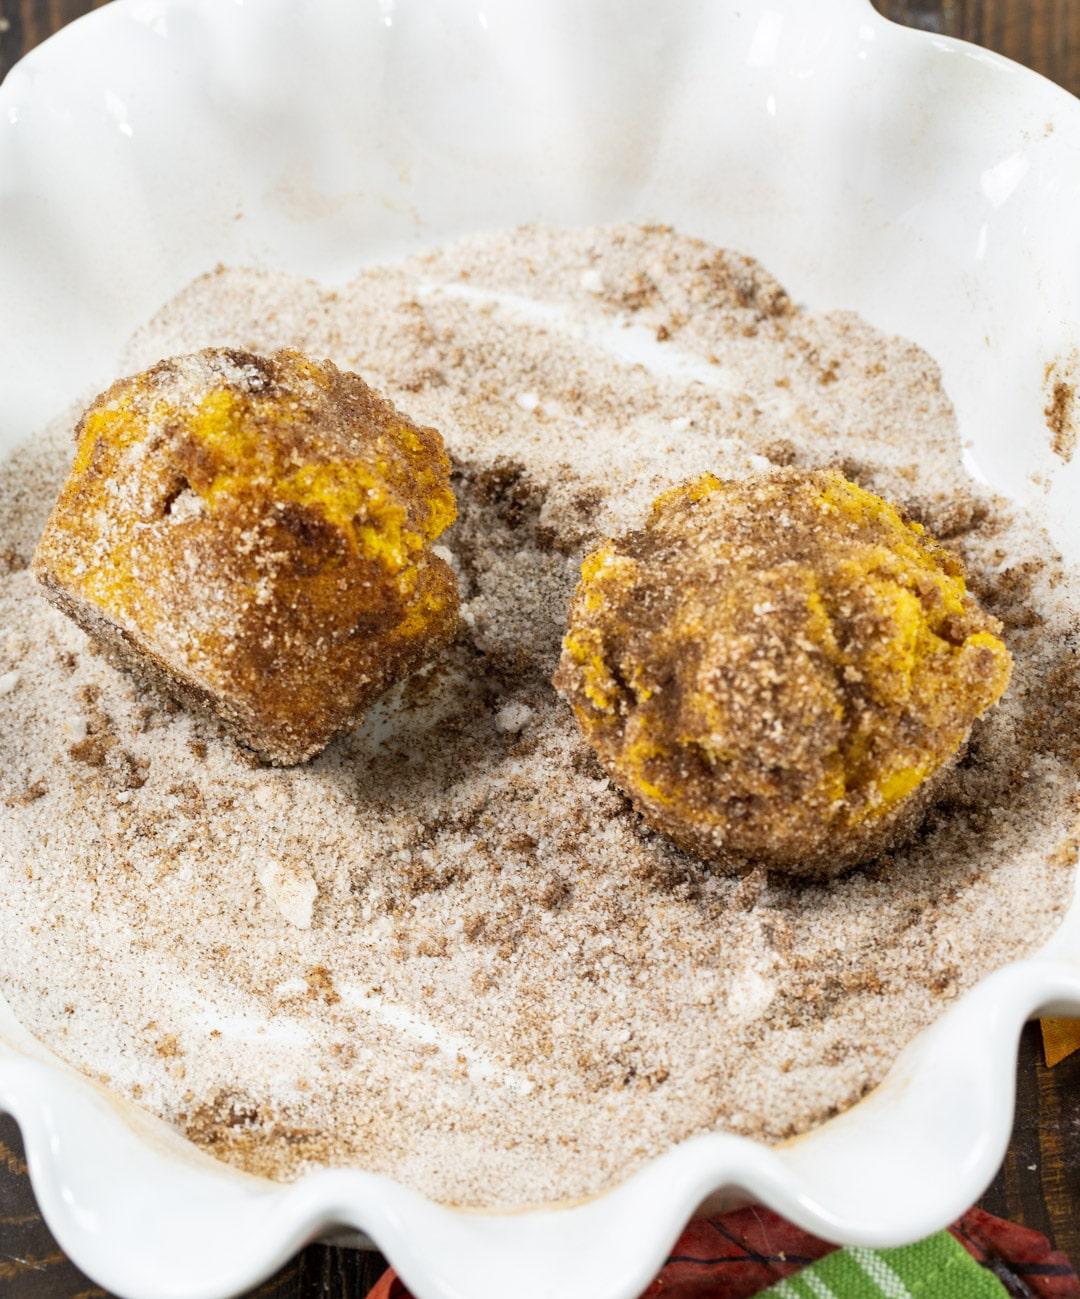 Muffins getting coated in cinnamon sugar.